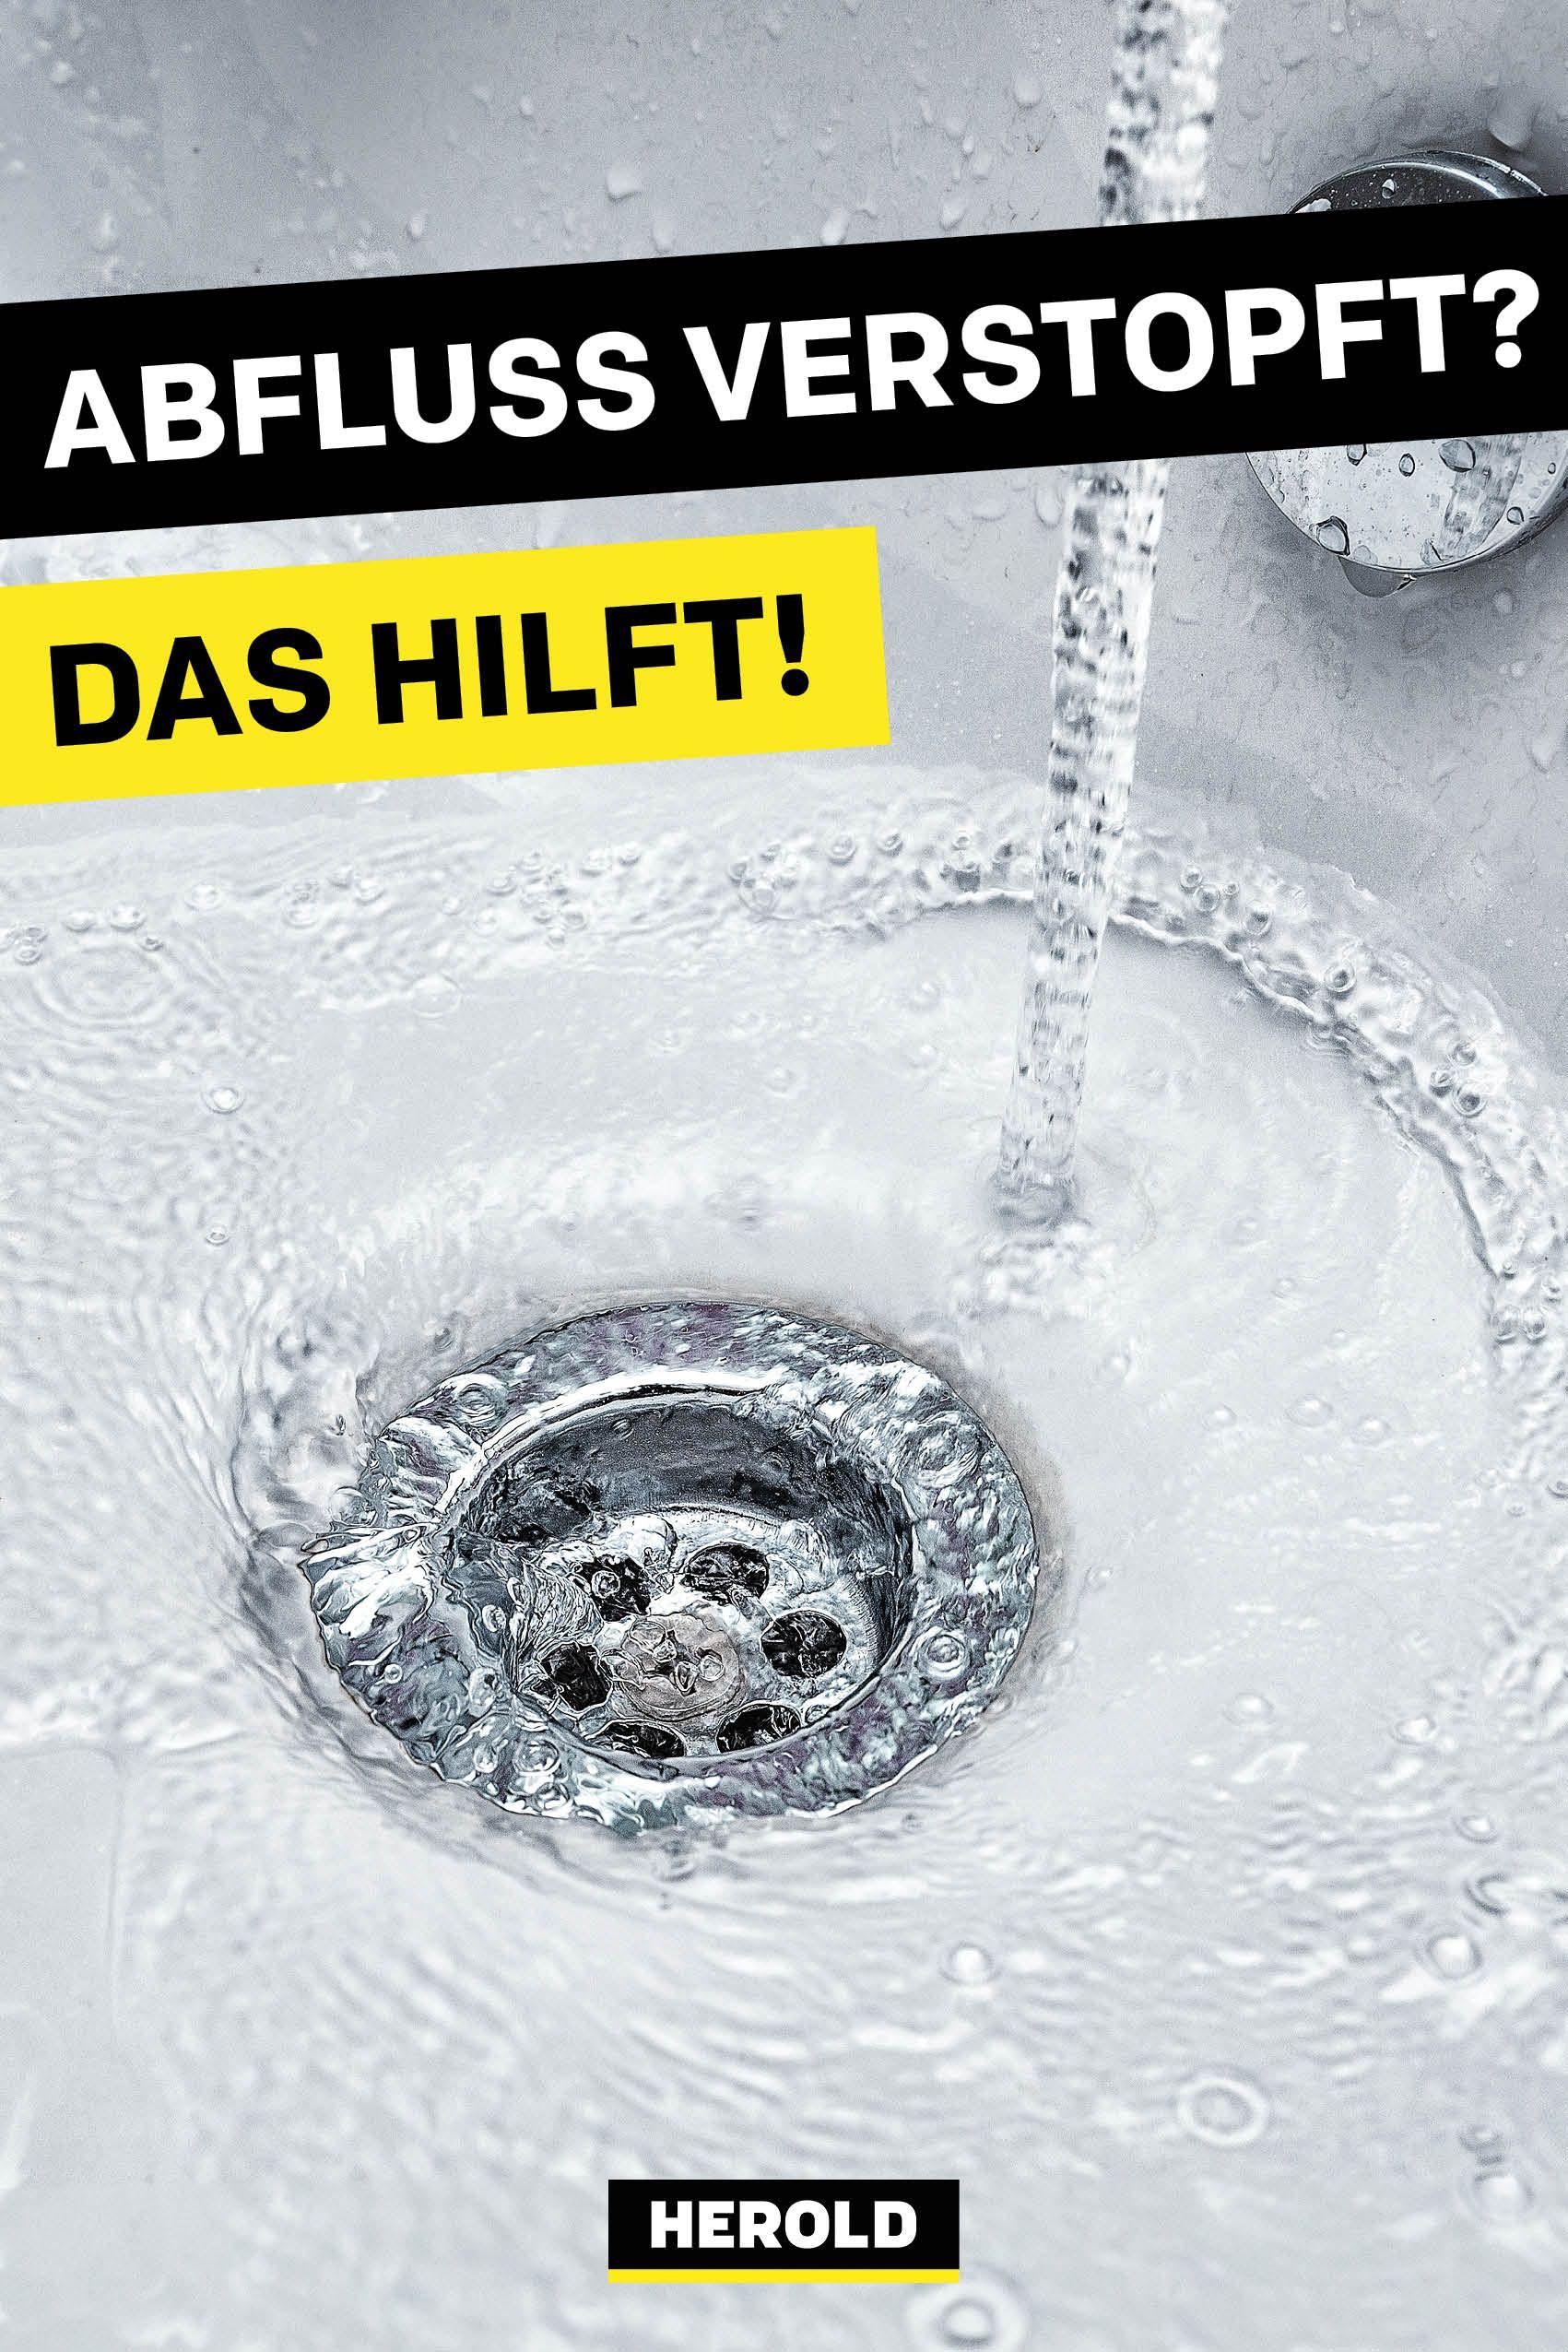 Abfluss Verstopft Diese Hausmittel Helfen Sofort Abfluss